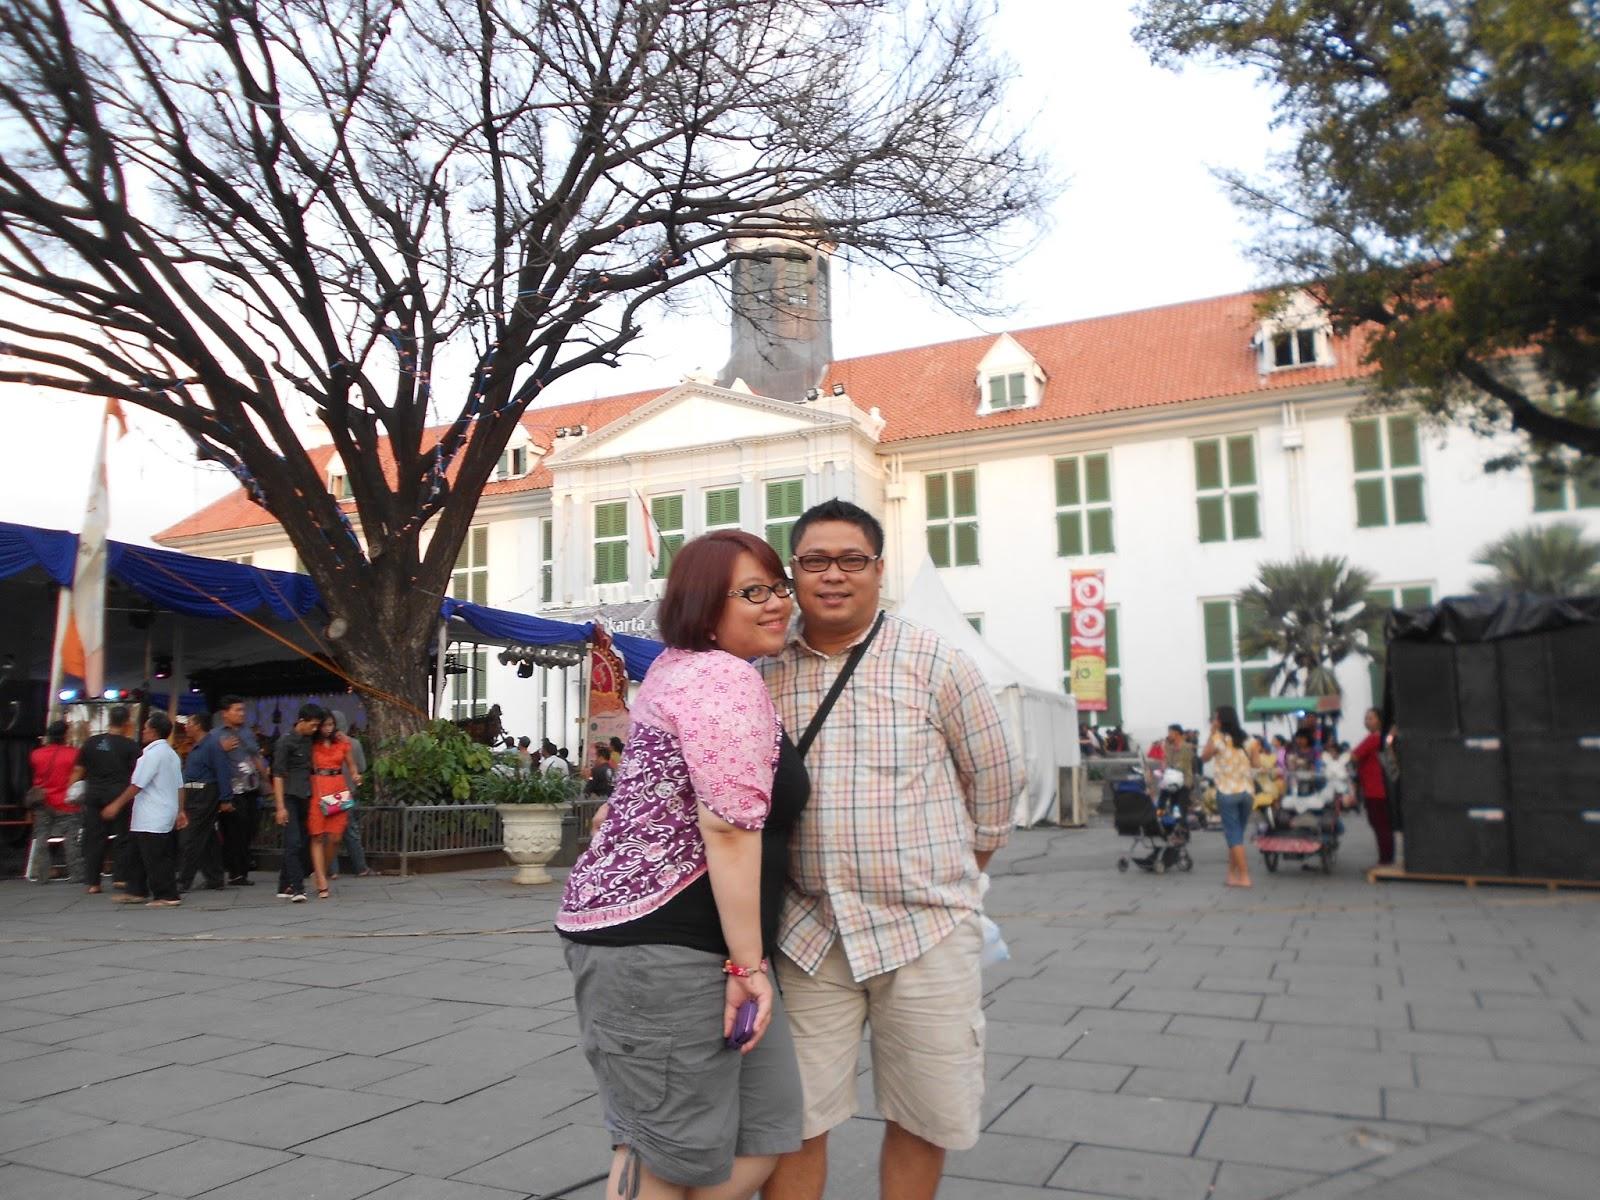 Menelusuri Jejak Batavia Diary Salunas Travelers Museum Terletak Kawasan Kota